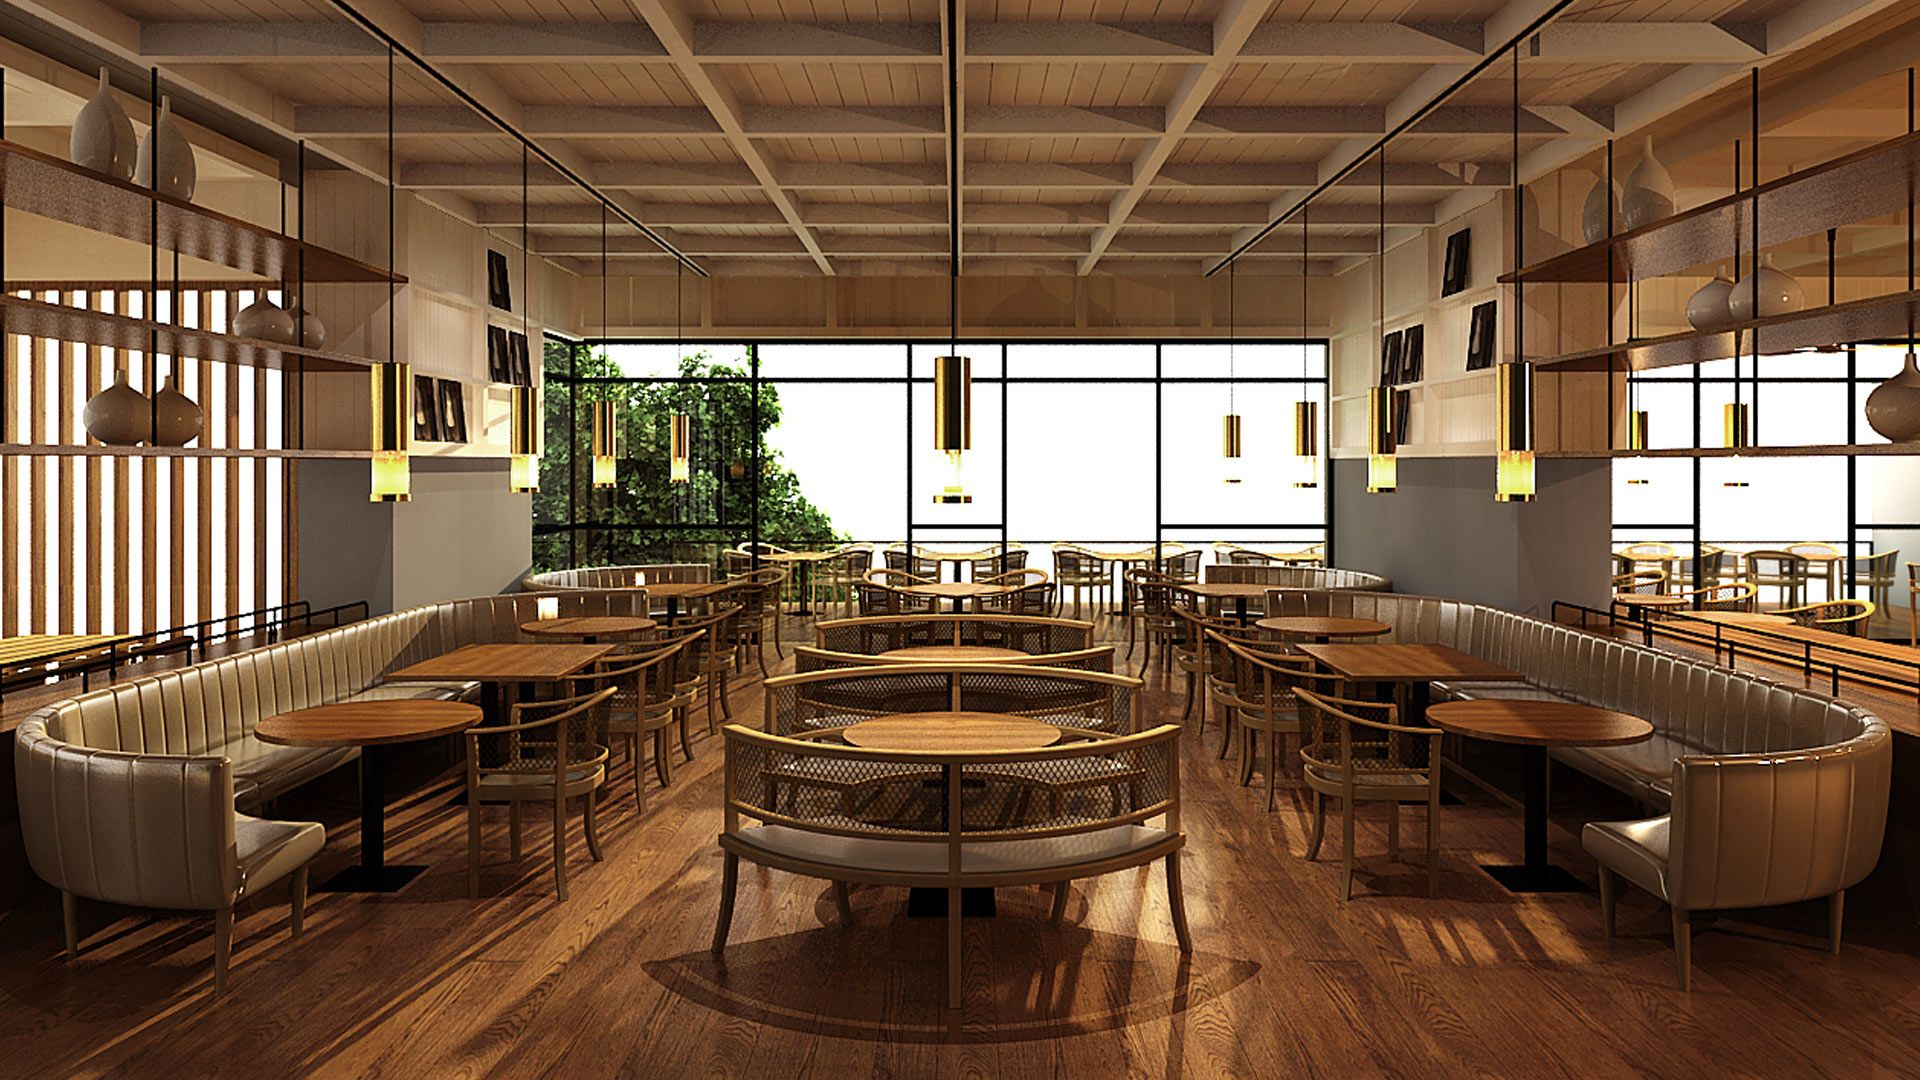 Atas Modern Malaysian Eatery Restaurant Design Inspiration Luxury Ceiling Design Hotel Buffet